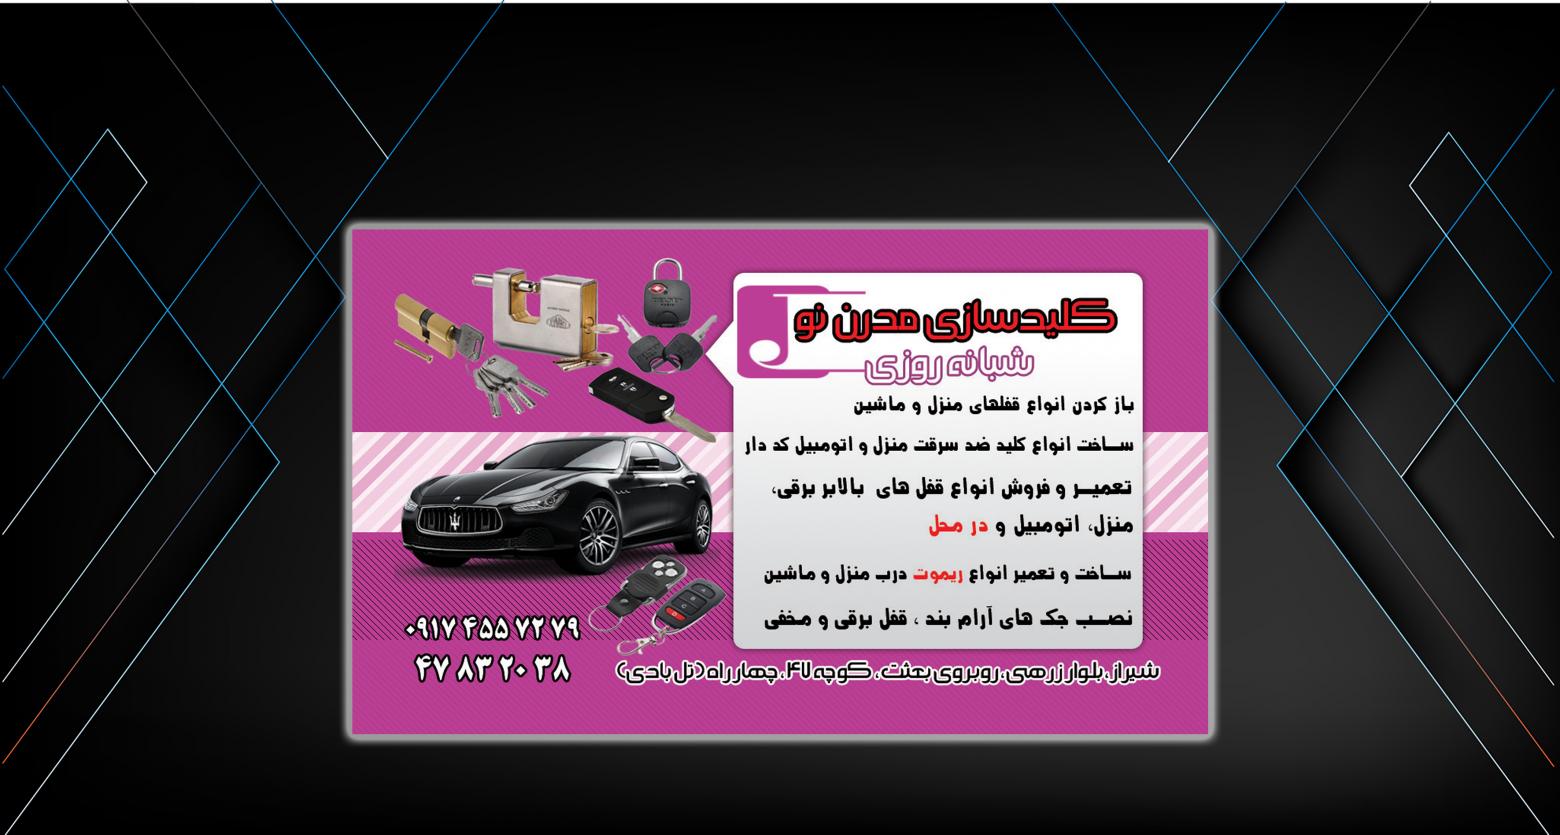 834e11210ff811bf928aefcaf6385cad 1560x835 - کارت ویزیت و برچسب لایه باز قفل و کلید سازی